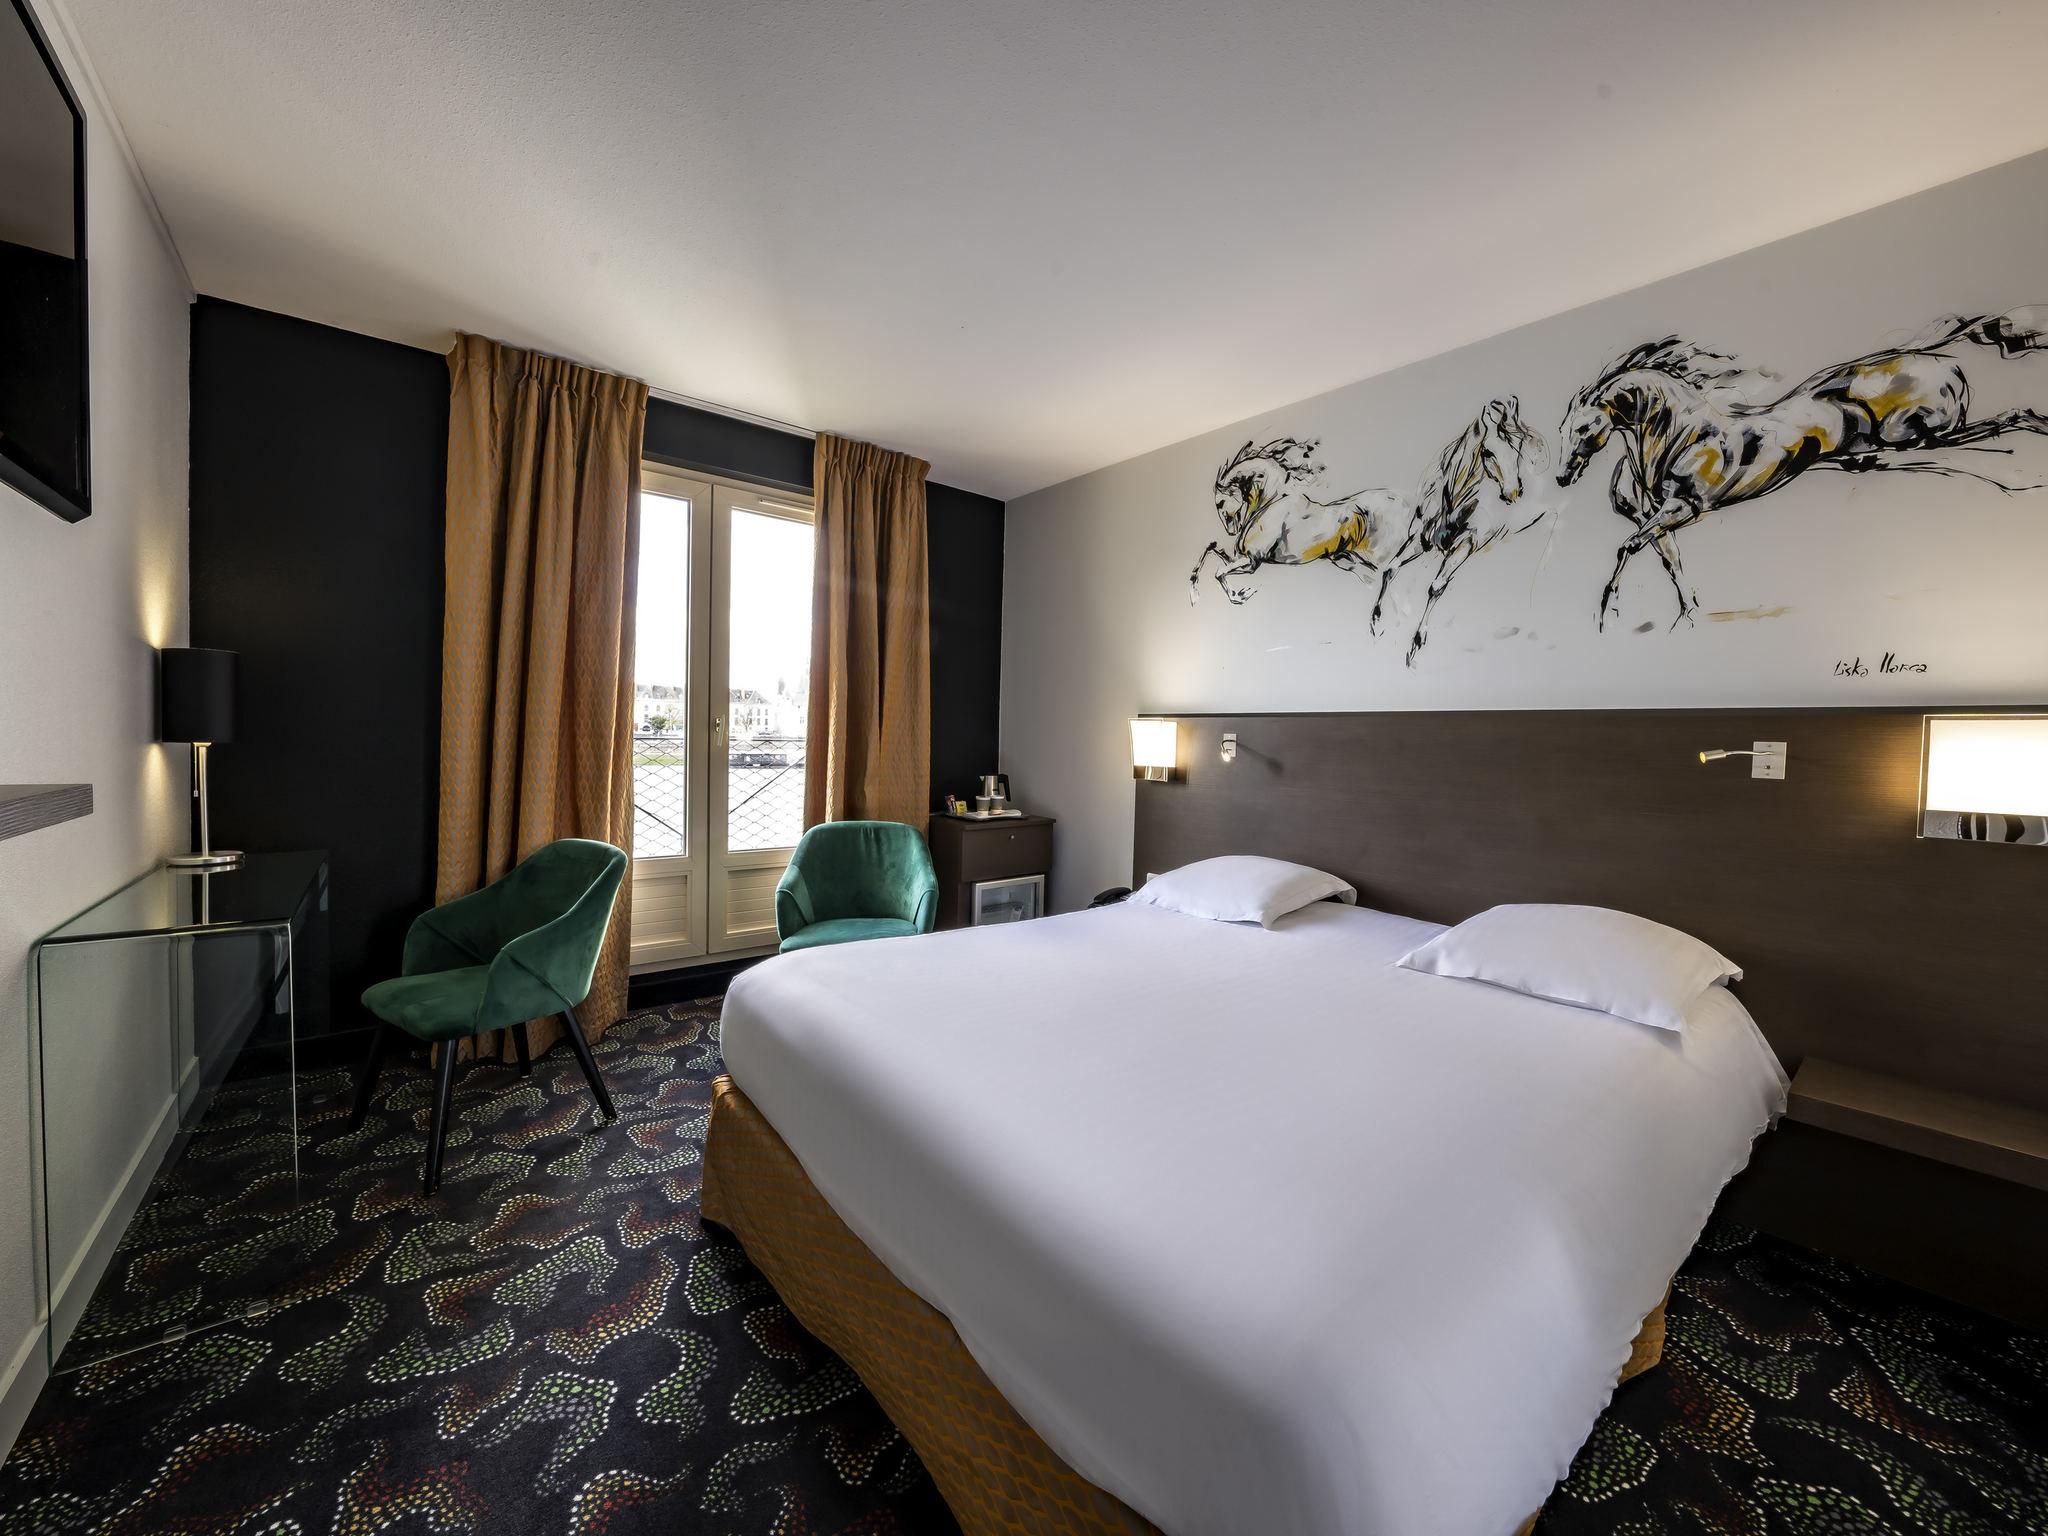 chambre d hote saumur pas cher chambre dhtes ng with chambre d hote saumur pas cher top refuge. Black Bedroom Furniture Sets. Home Design Ideas